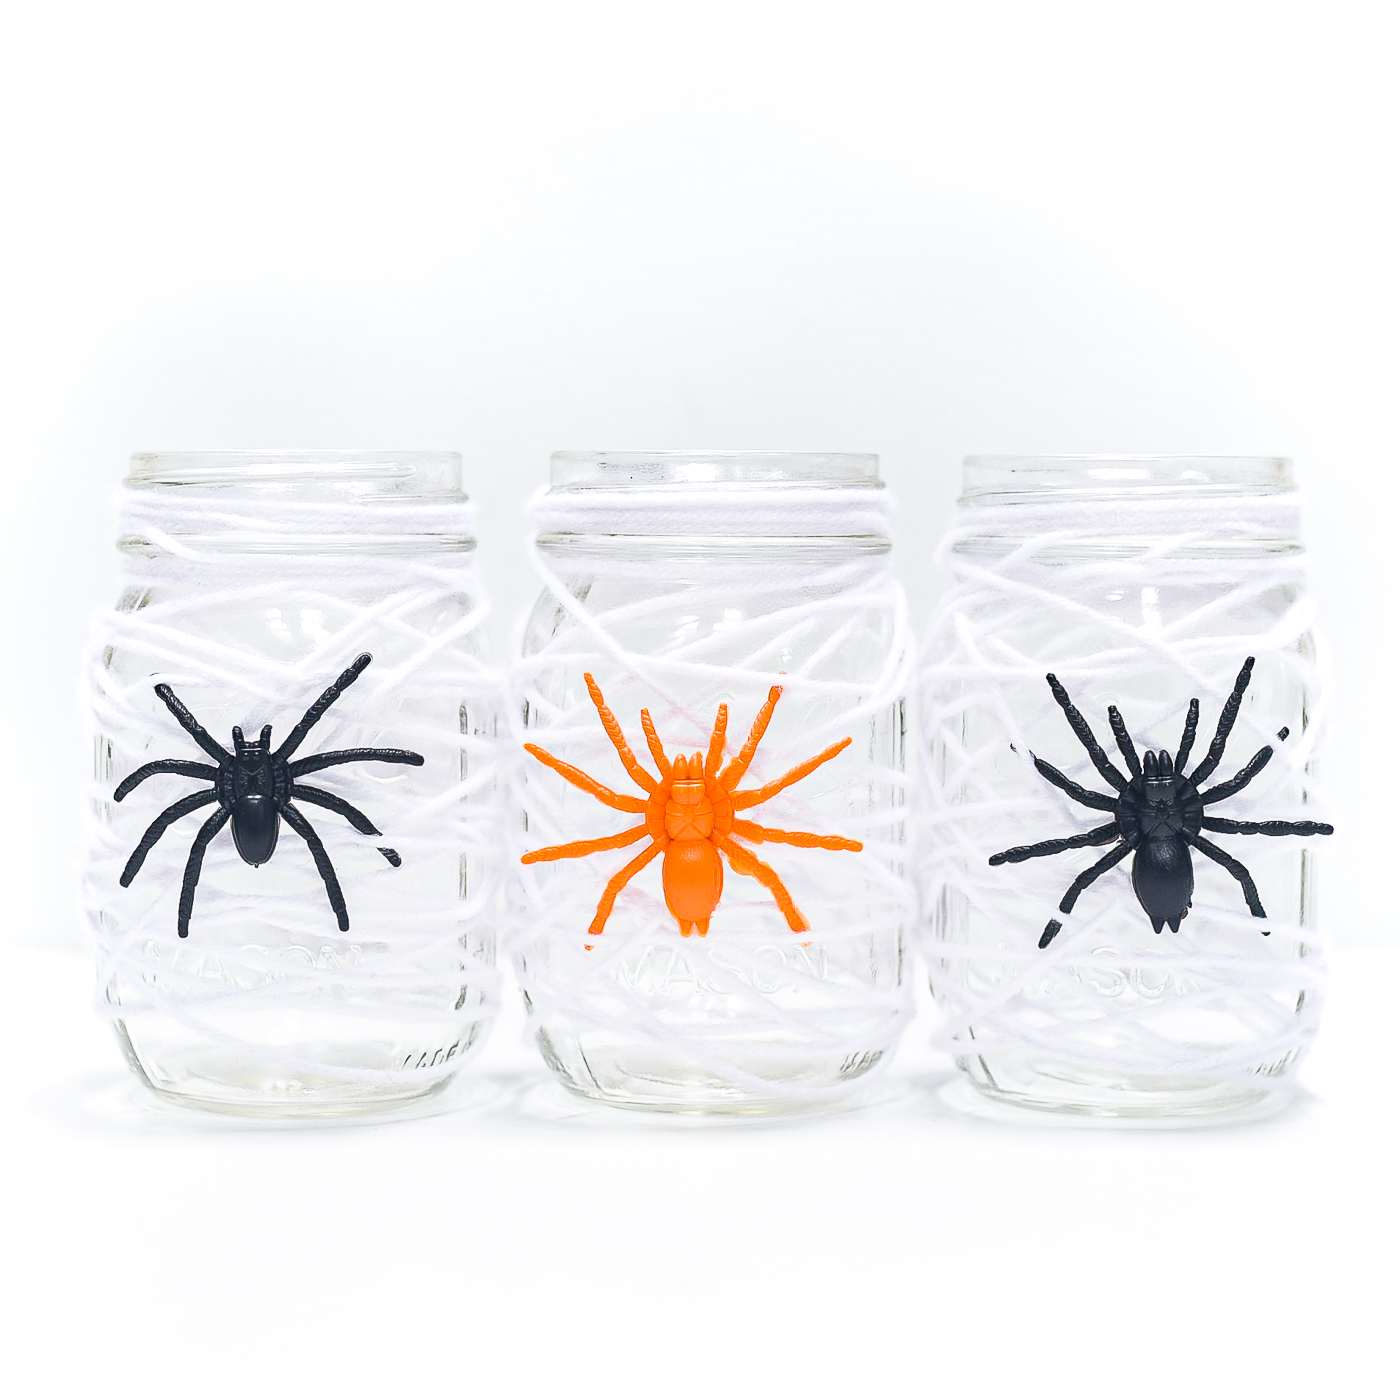 Spider Web Mason Jar - Easy Halloween Crafts with Jars - Mason Jar Crafts for Halloween